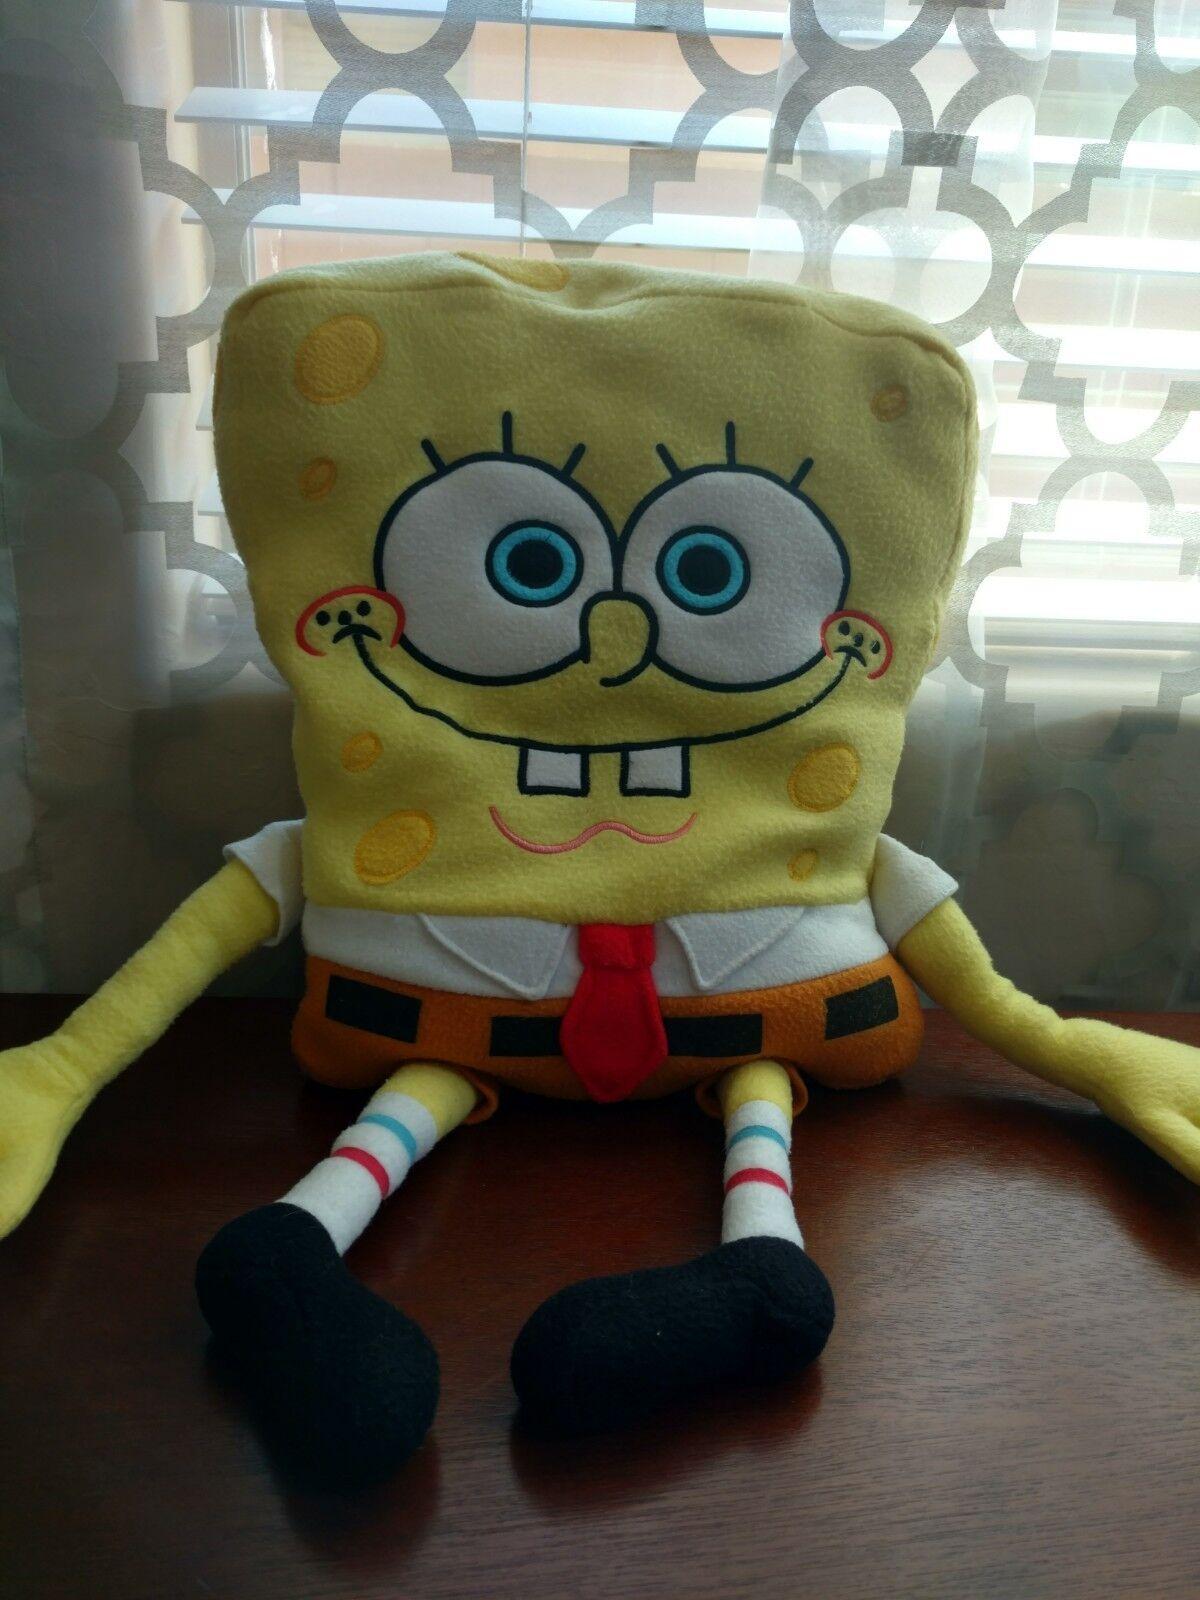 Spongebob Squarepants Happy SPONGEBOB Large Large Large BIG Jumbo 21  Plush Bed Pillow Doll 4393af